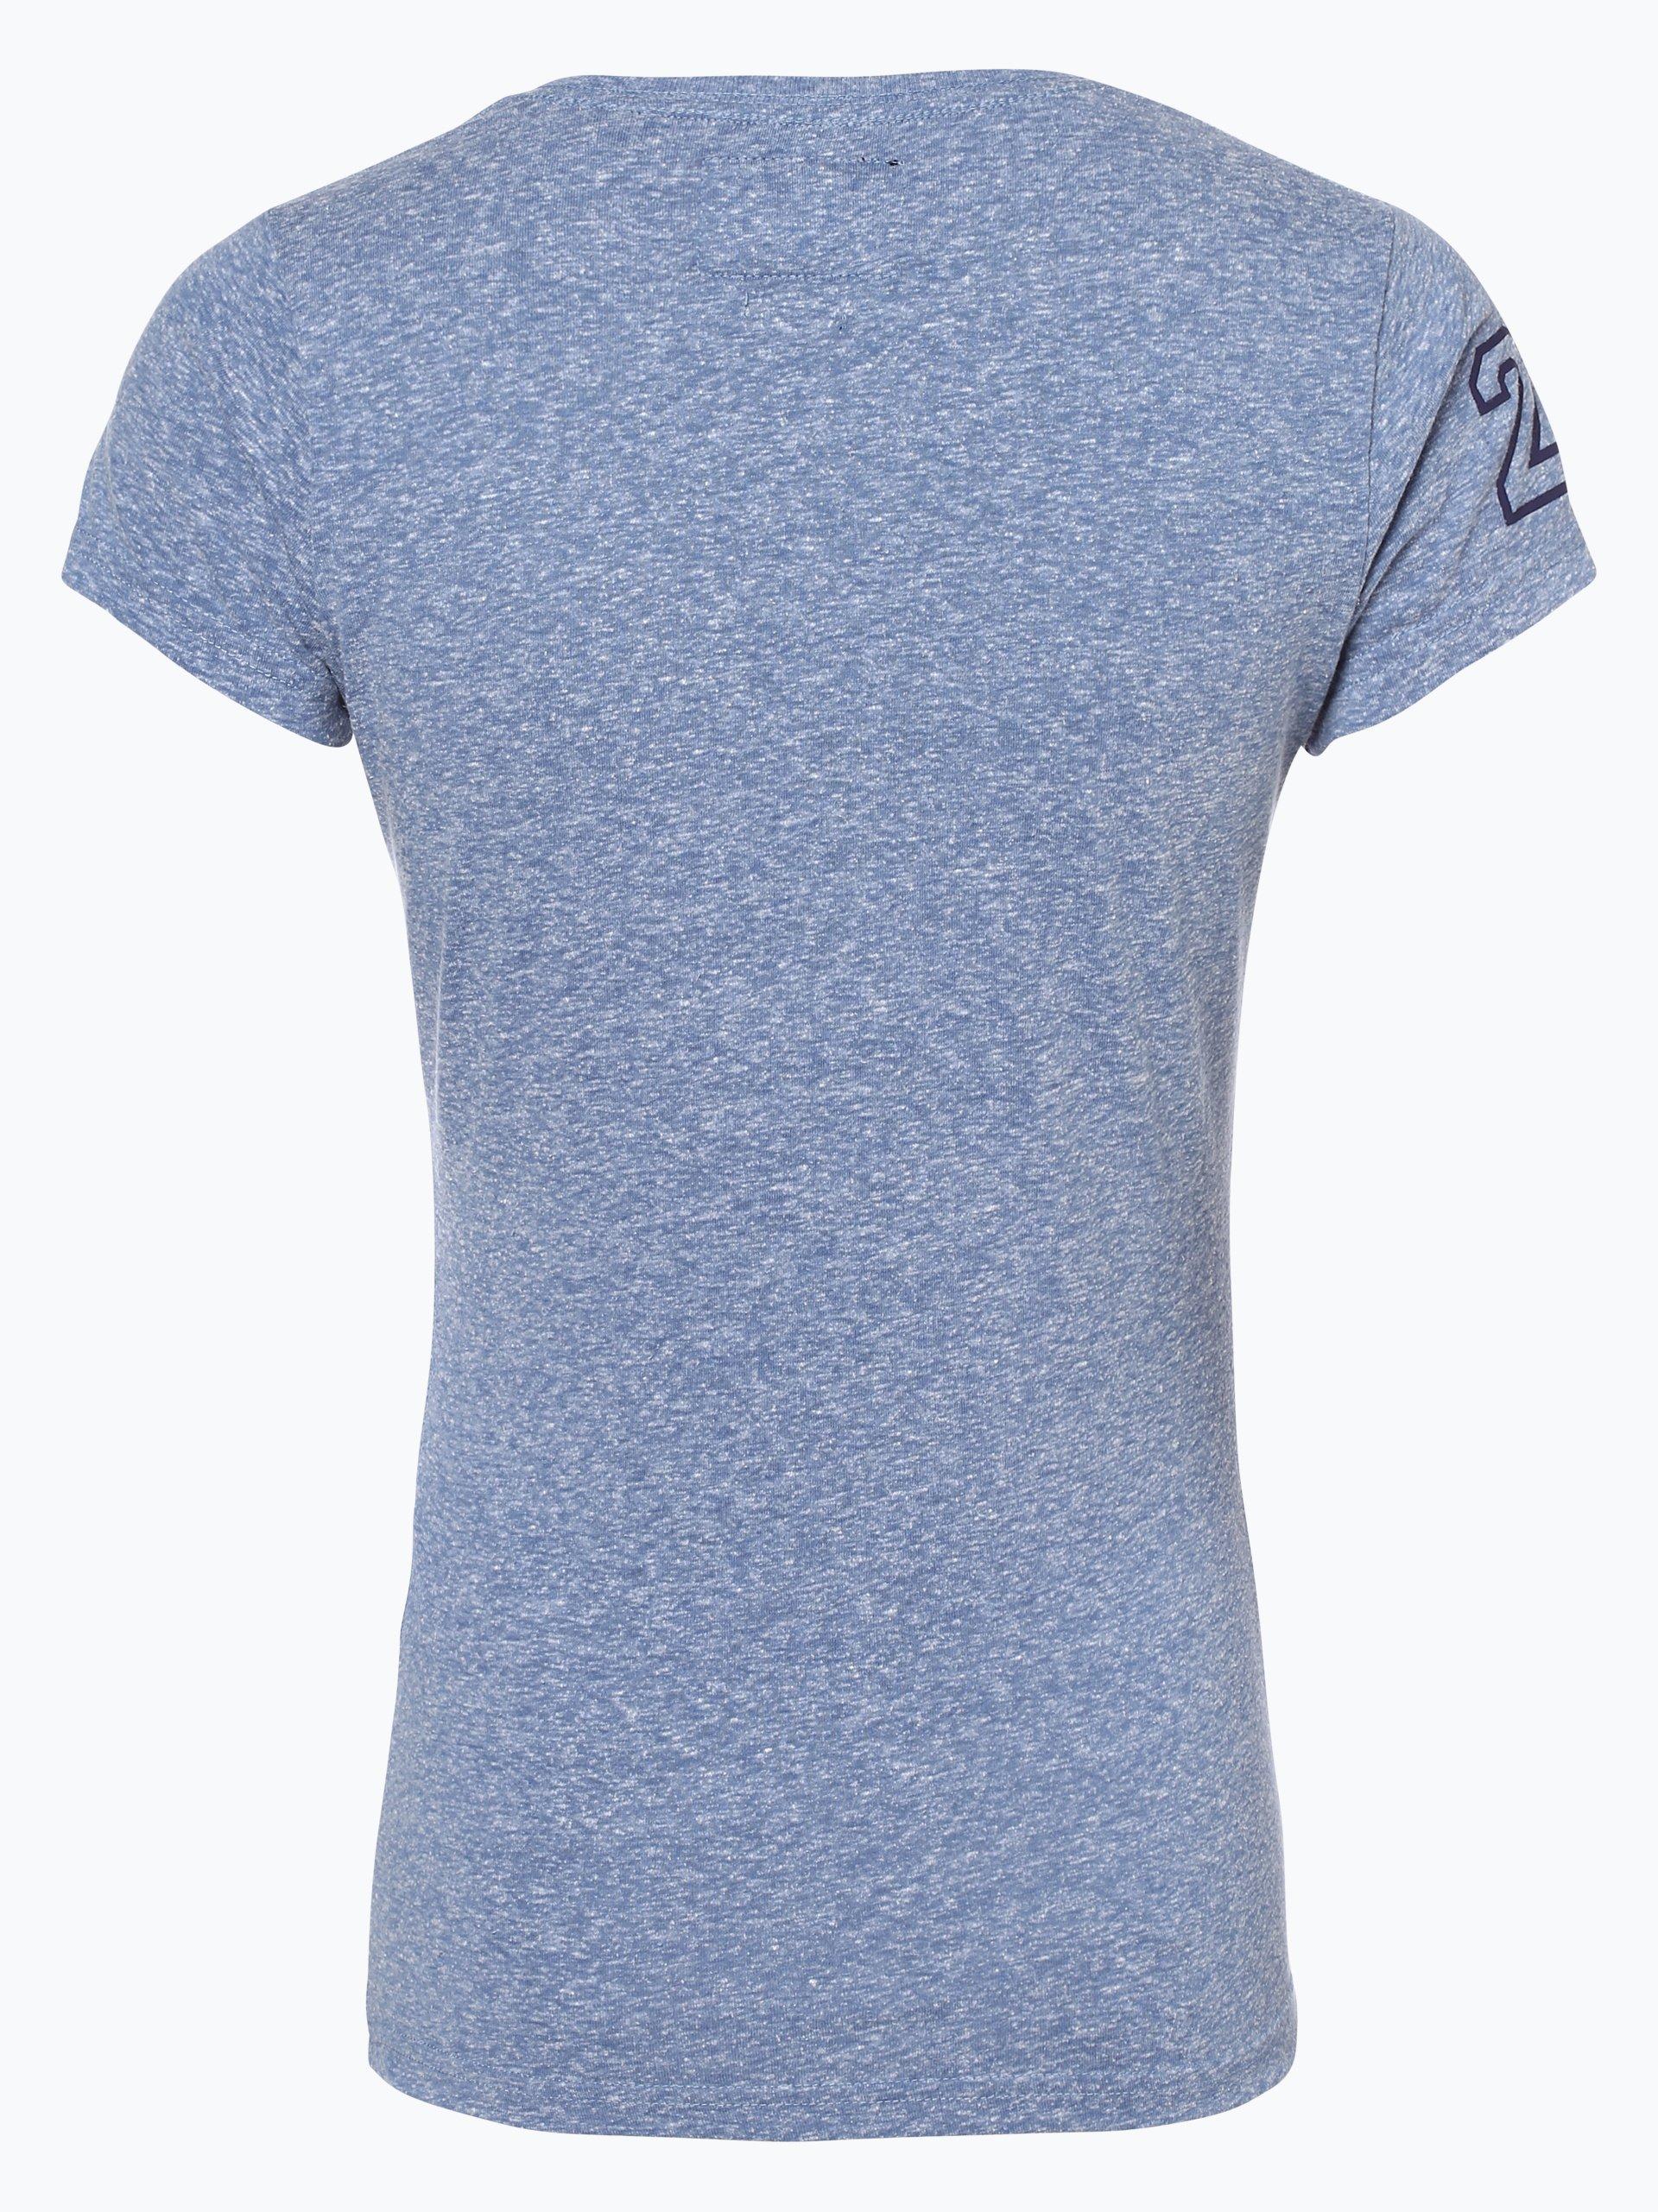 superdry damen t shirt hellblau blau gemustert online. Black Bedroom Furniture Sets. Home Design Ideas